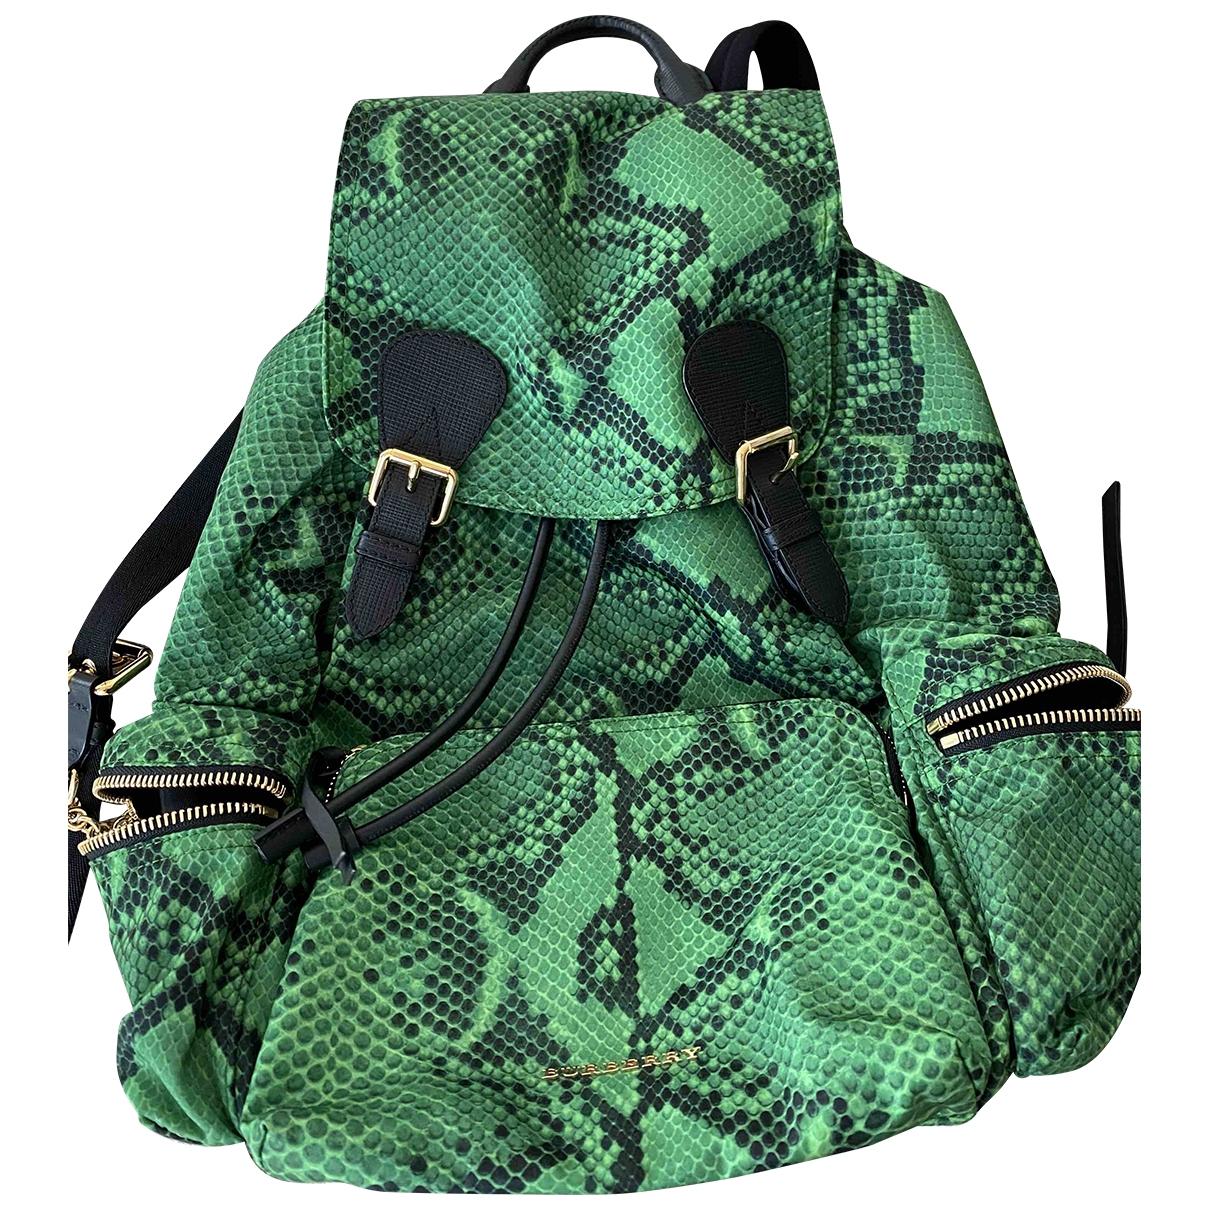 Burberry - Sac a dos The Rucksack pour femme en toile - vert